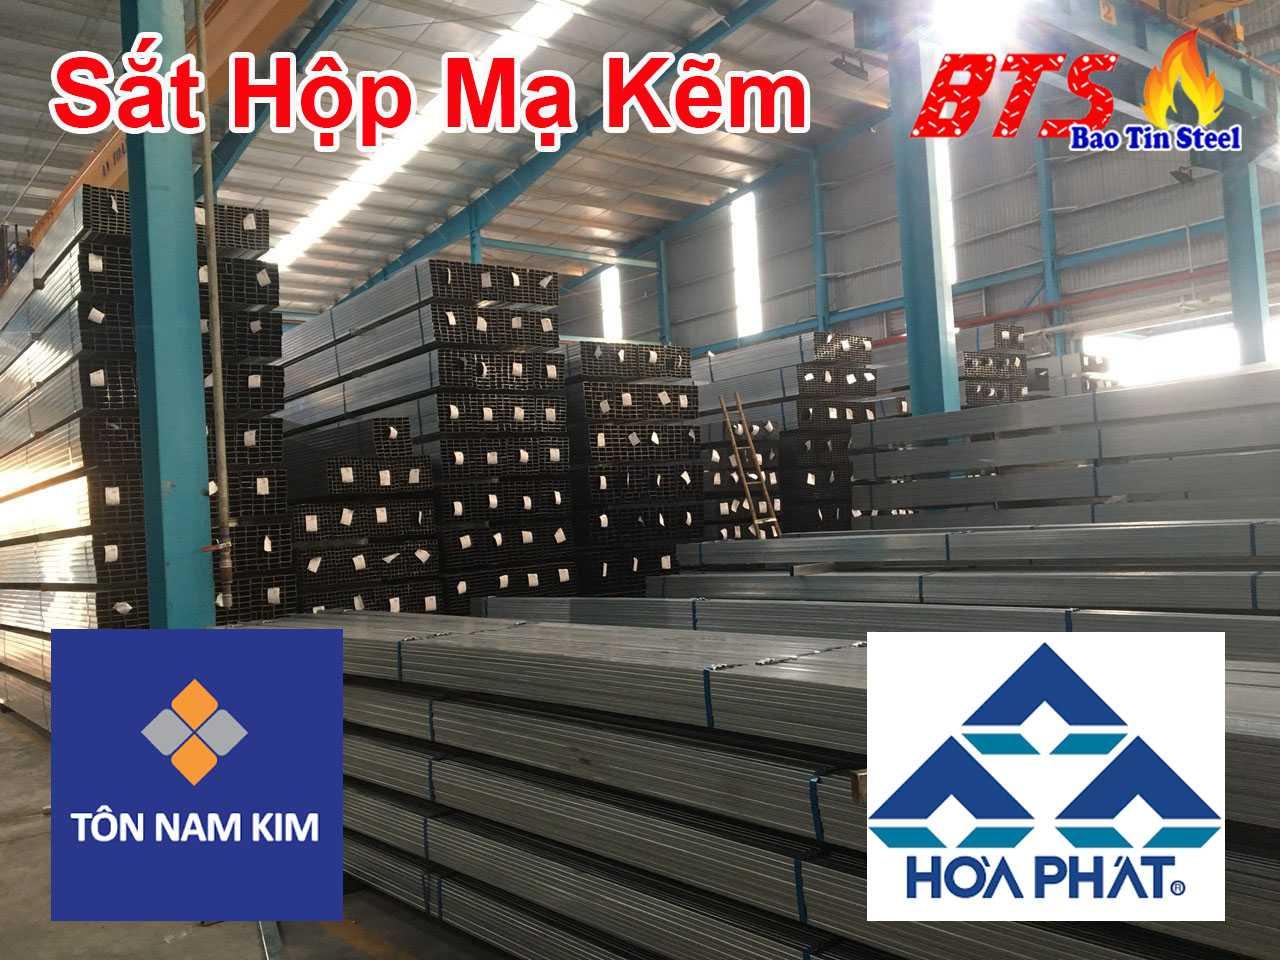 sắt hộp mạ kẽm Hòa Phát Nam Kim